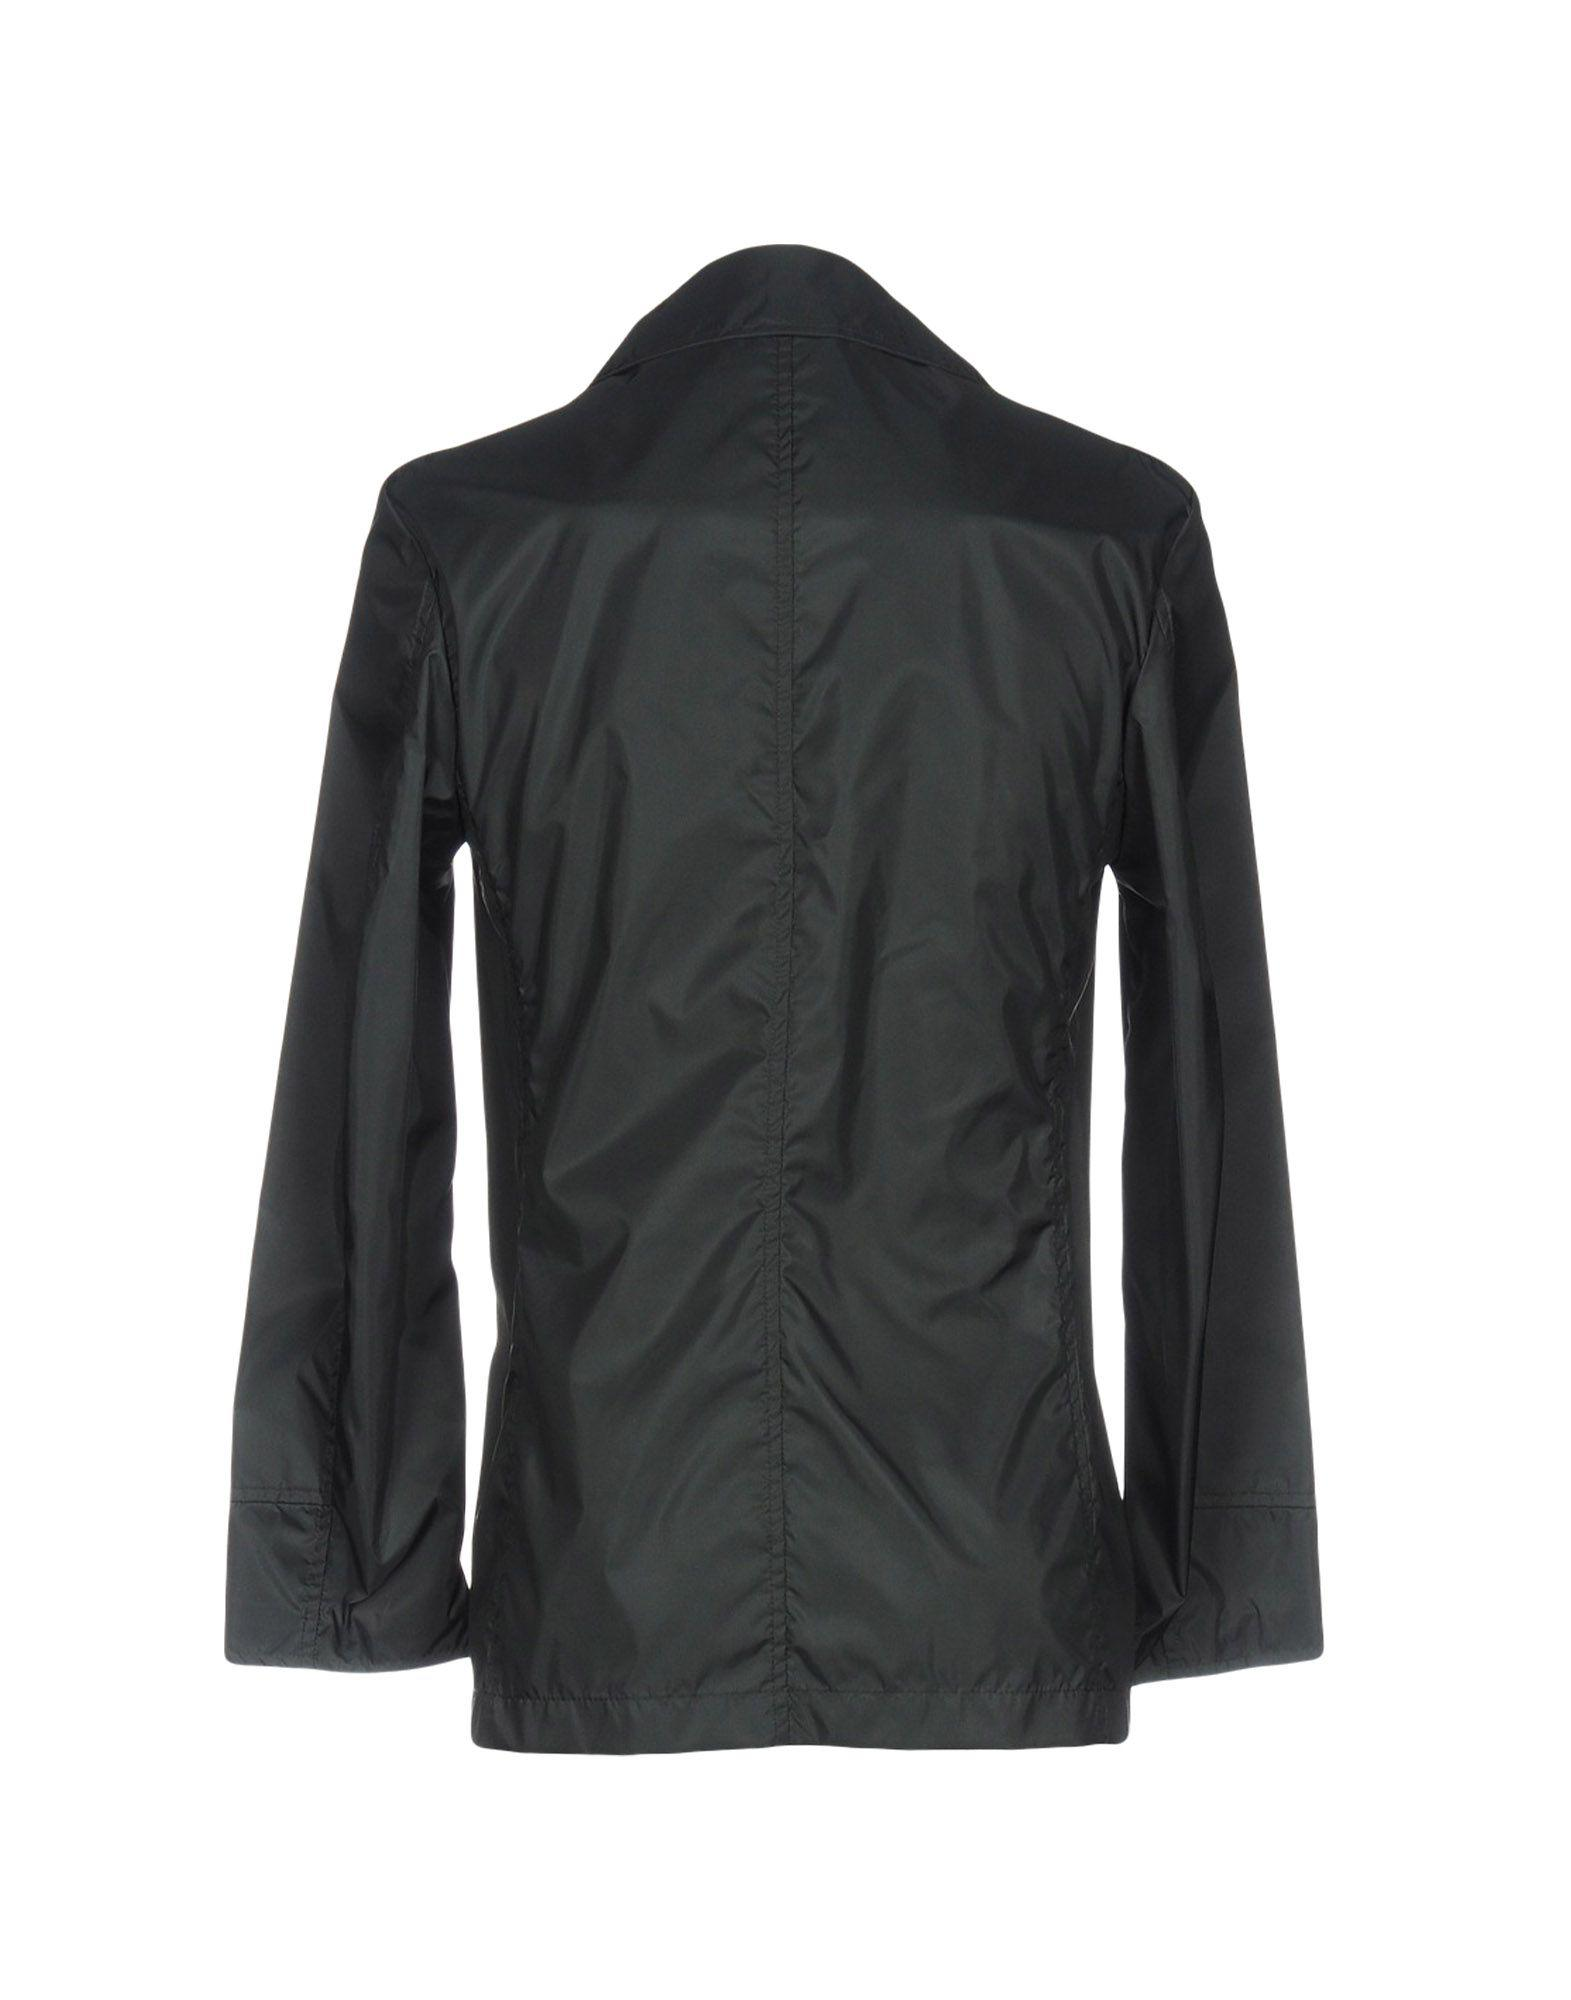 Camplin Synthetic Jacket for Men